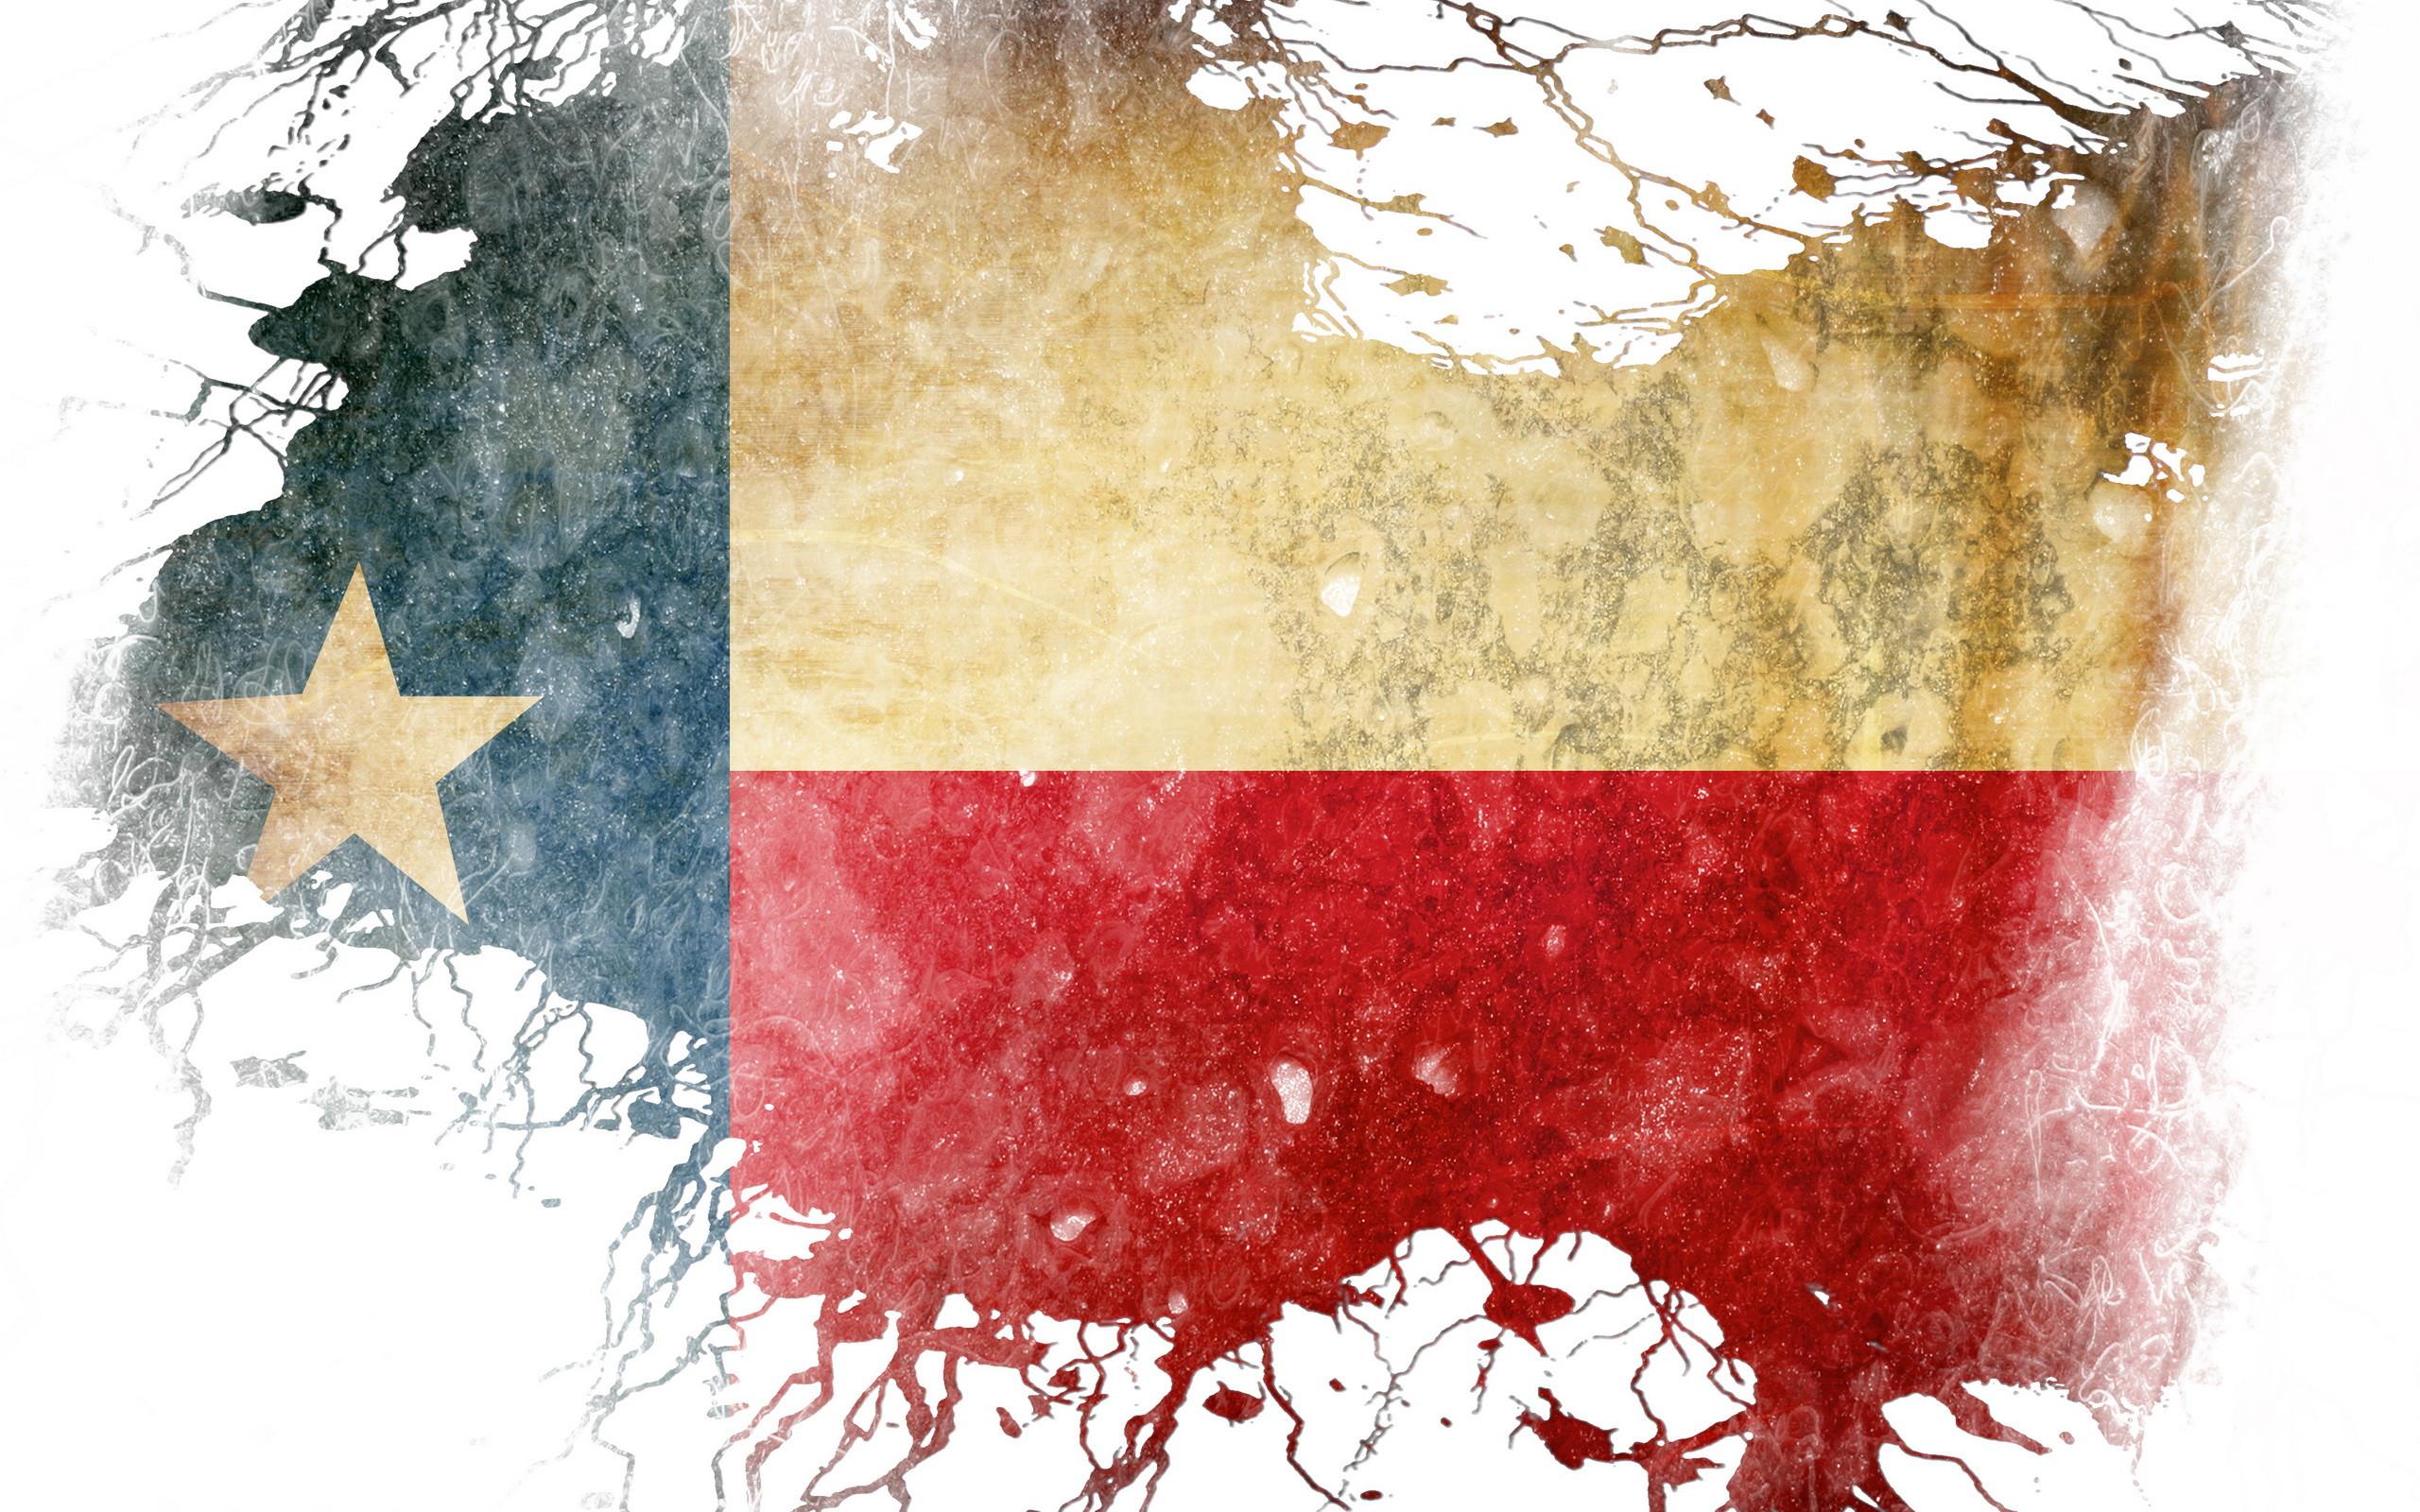 Texas flag wallpaper 54 images - Texas flag wallpaper ...